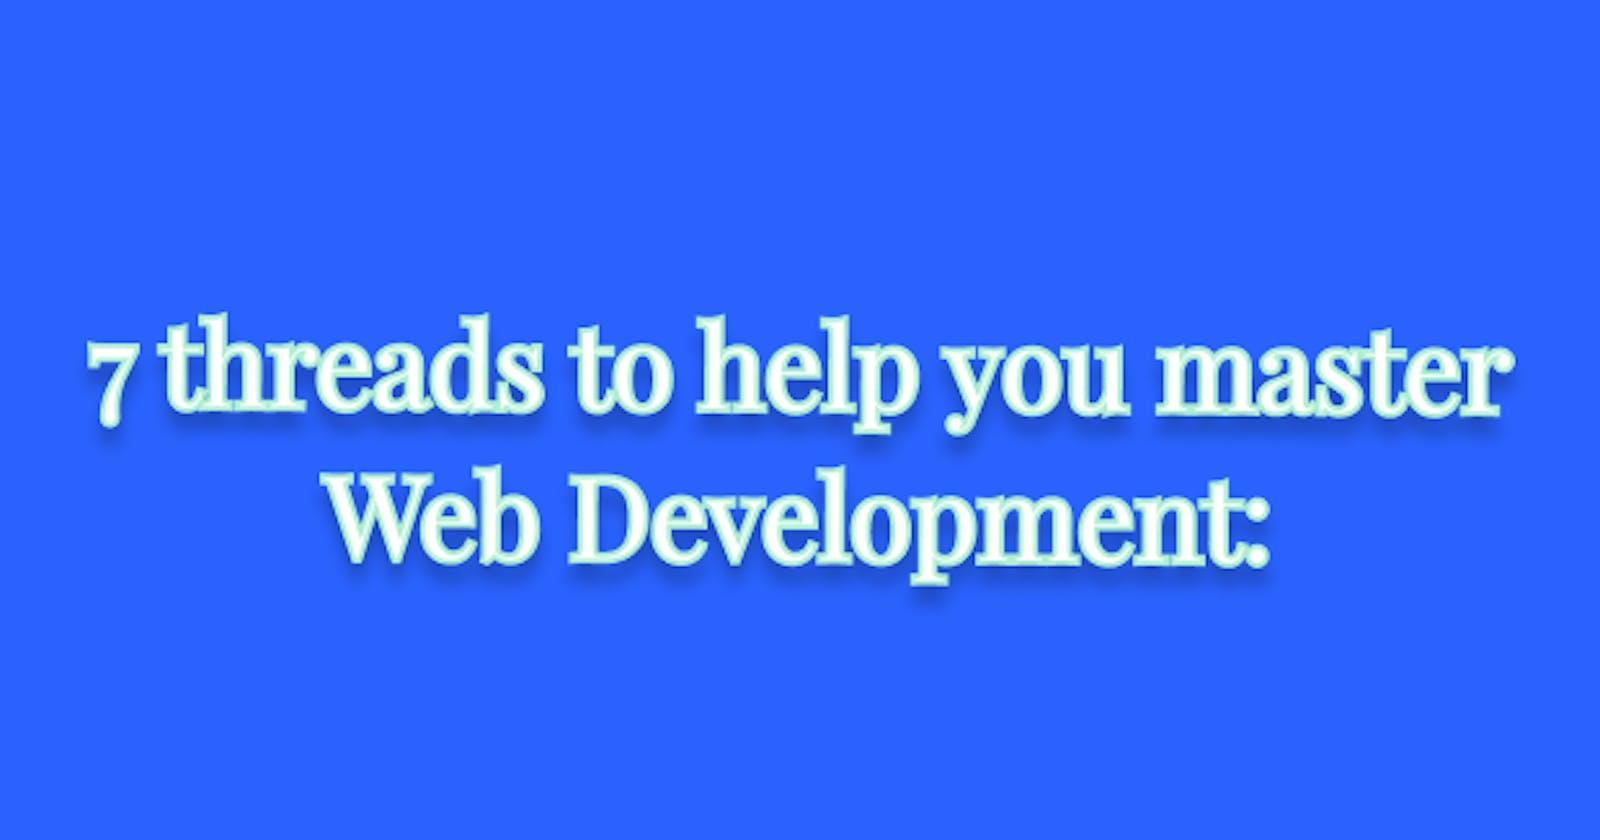 7 Twitter threads to help you master Web Development